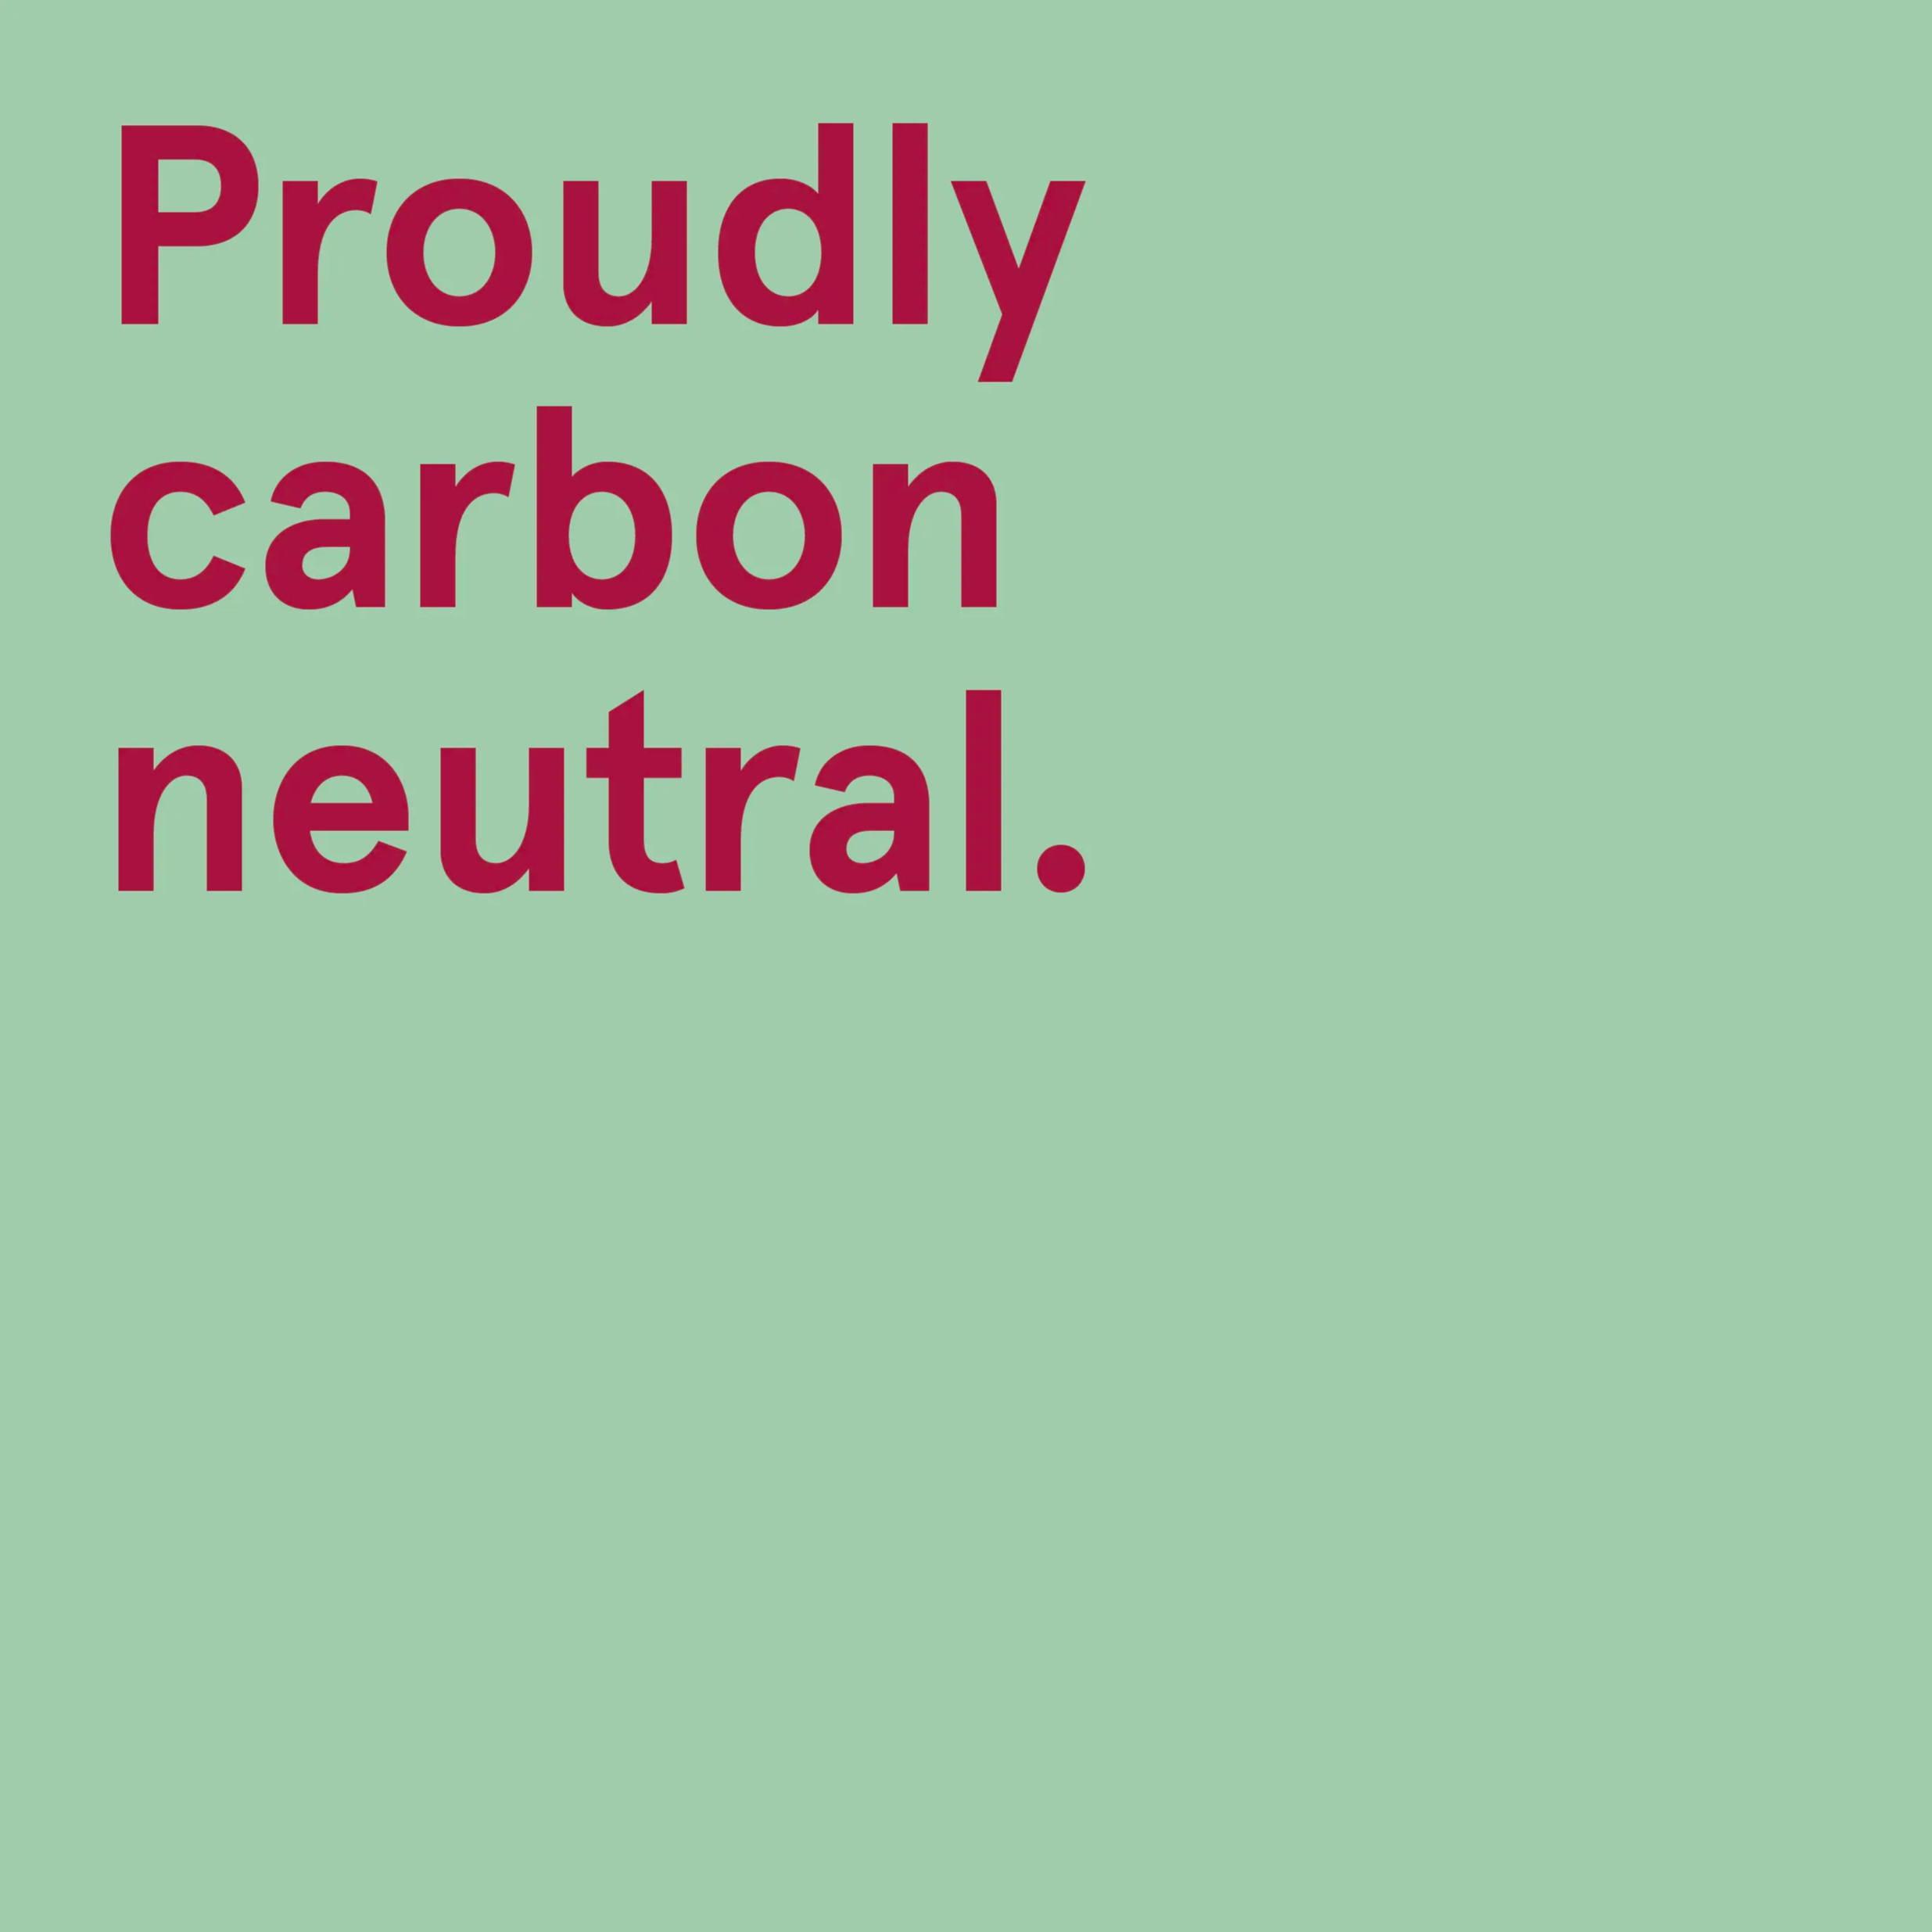 Proudly carbon neutral